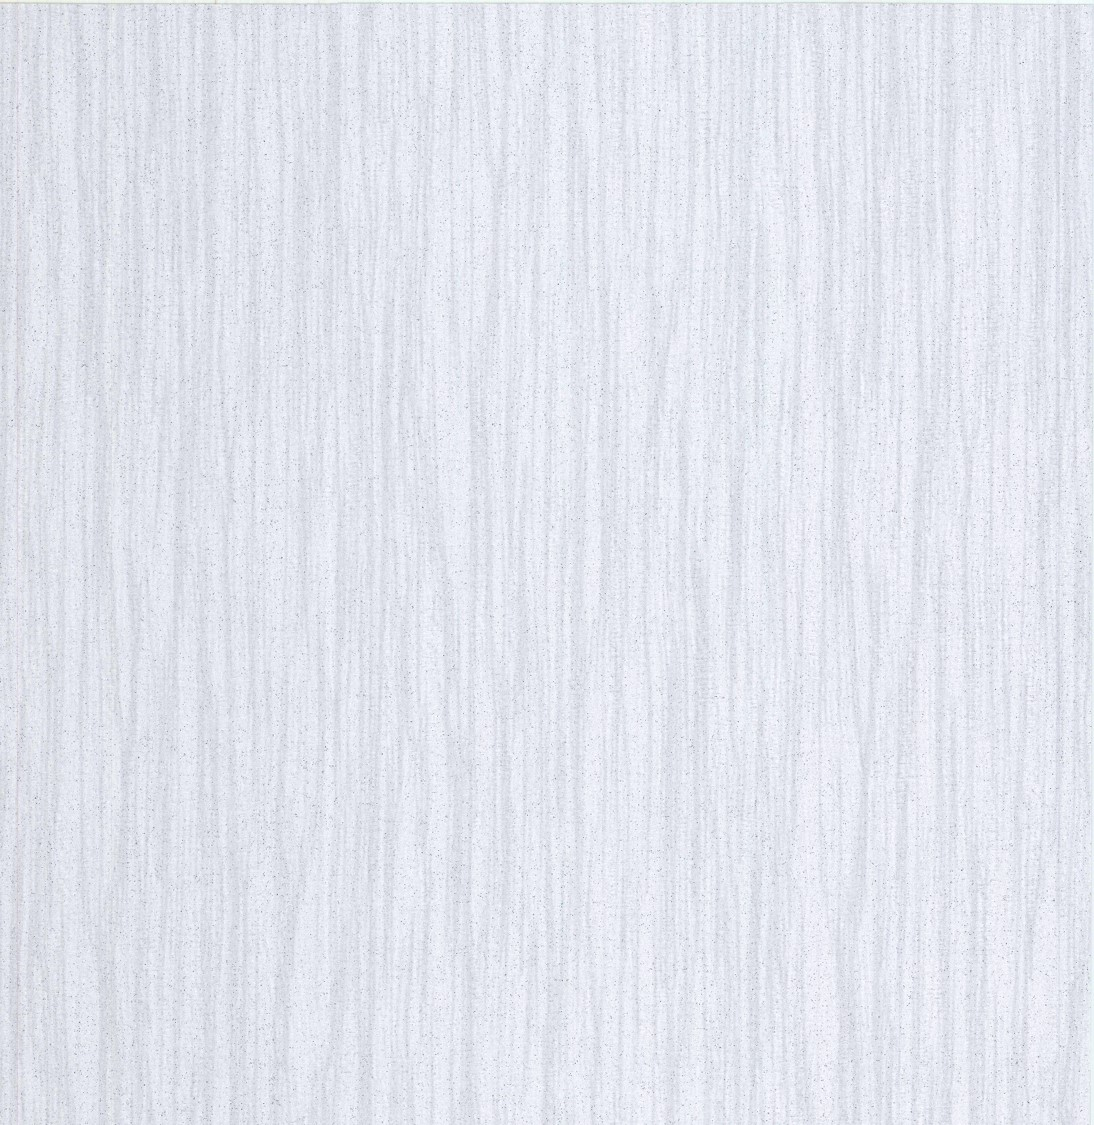 Fine decor milano 6 textured vinyl wallpaper m95574 for Textured vinyl wallpaper bathroom